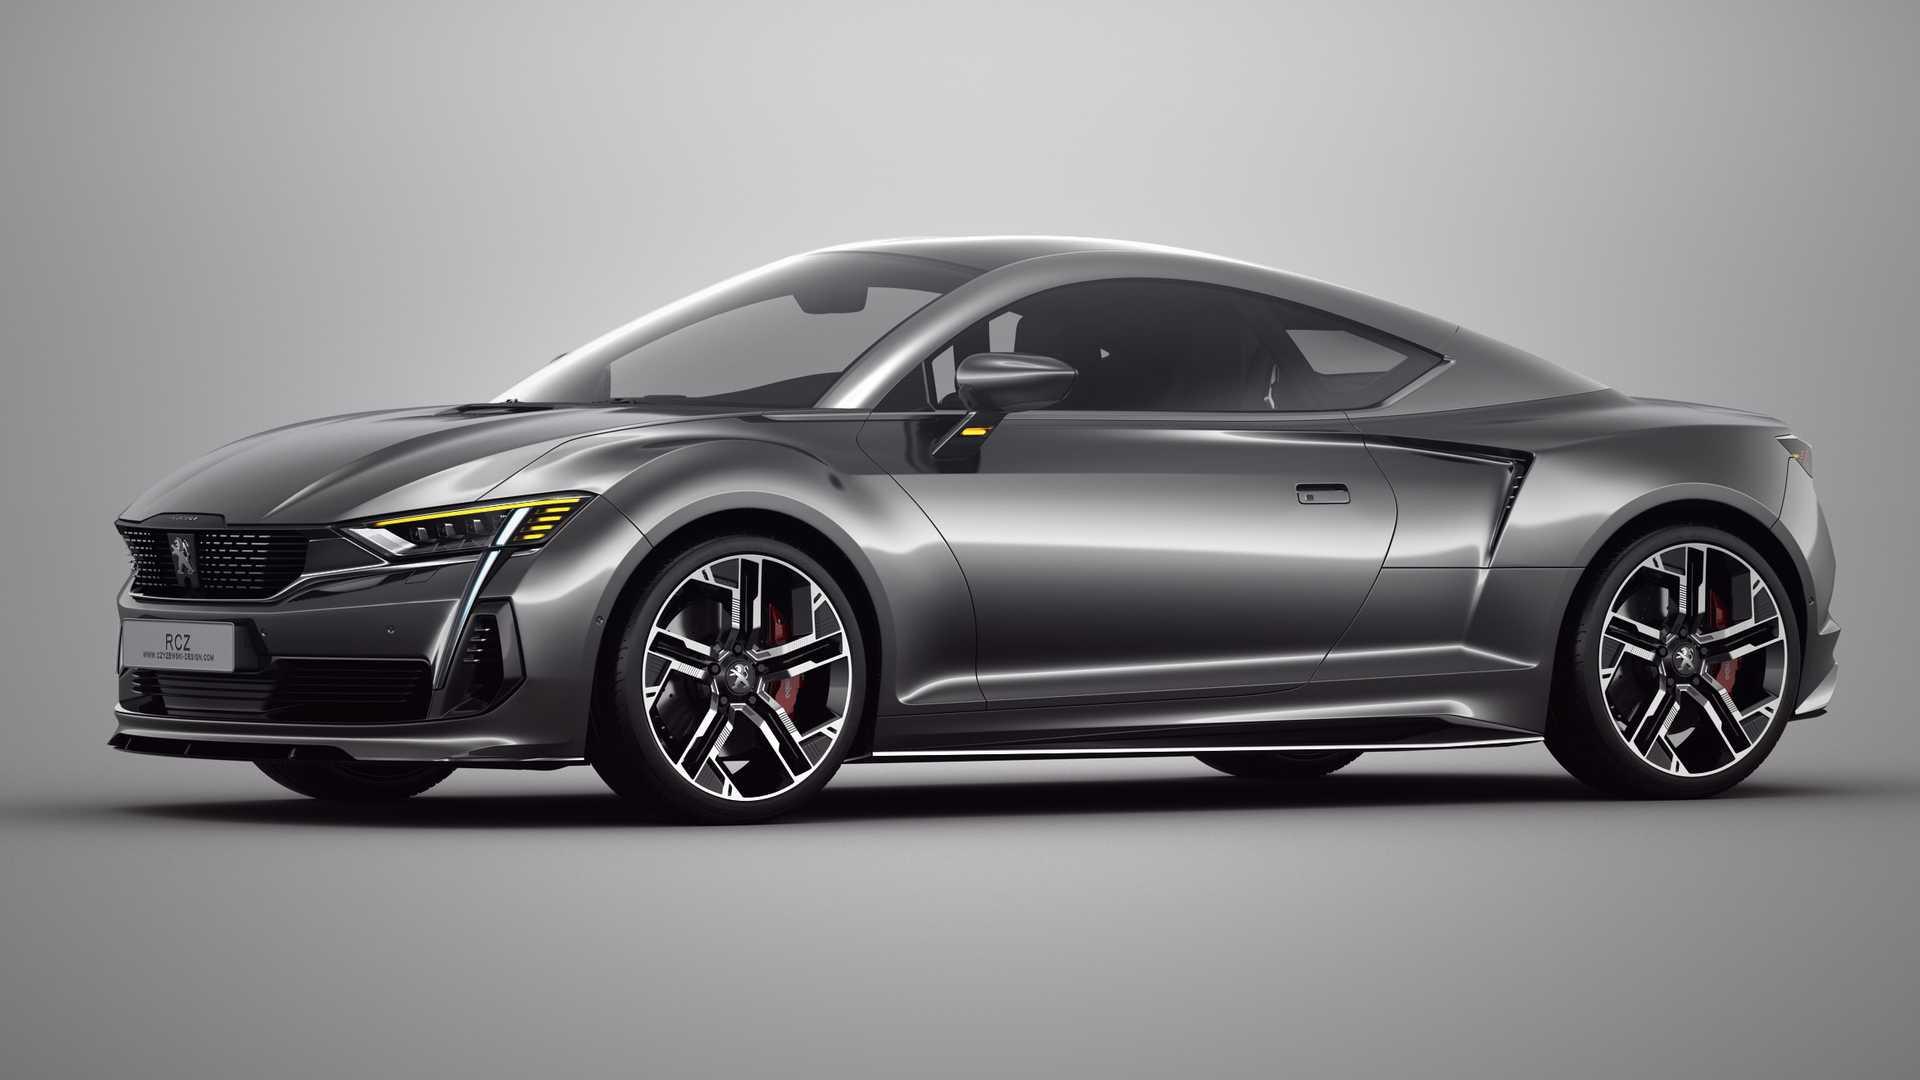 2020_Peugeot_RCZ_rendering_0008